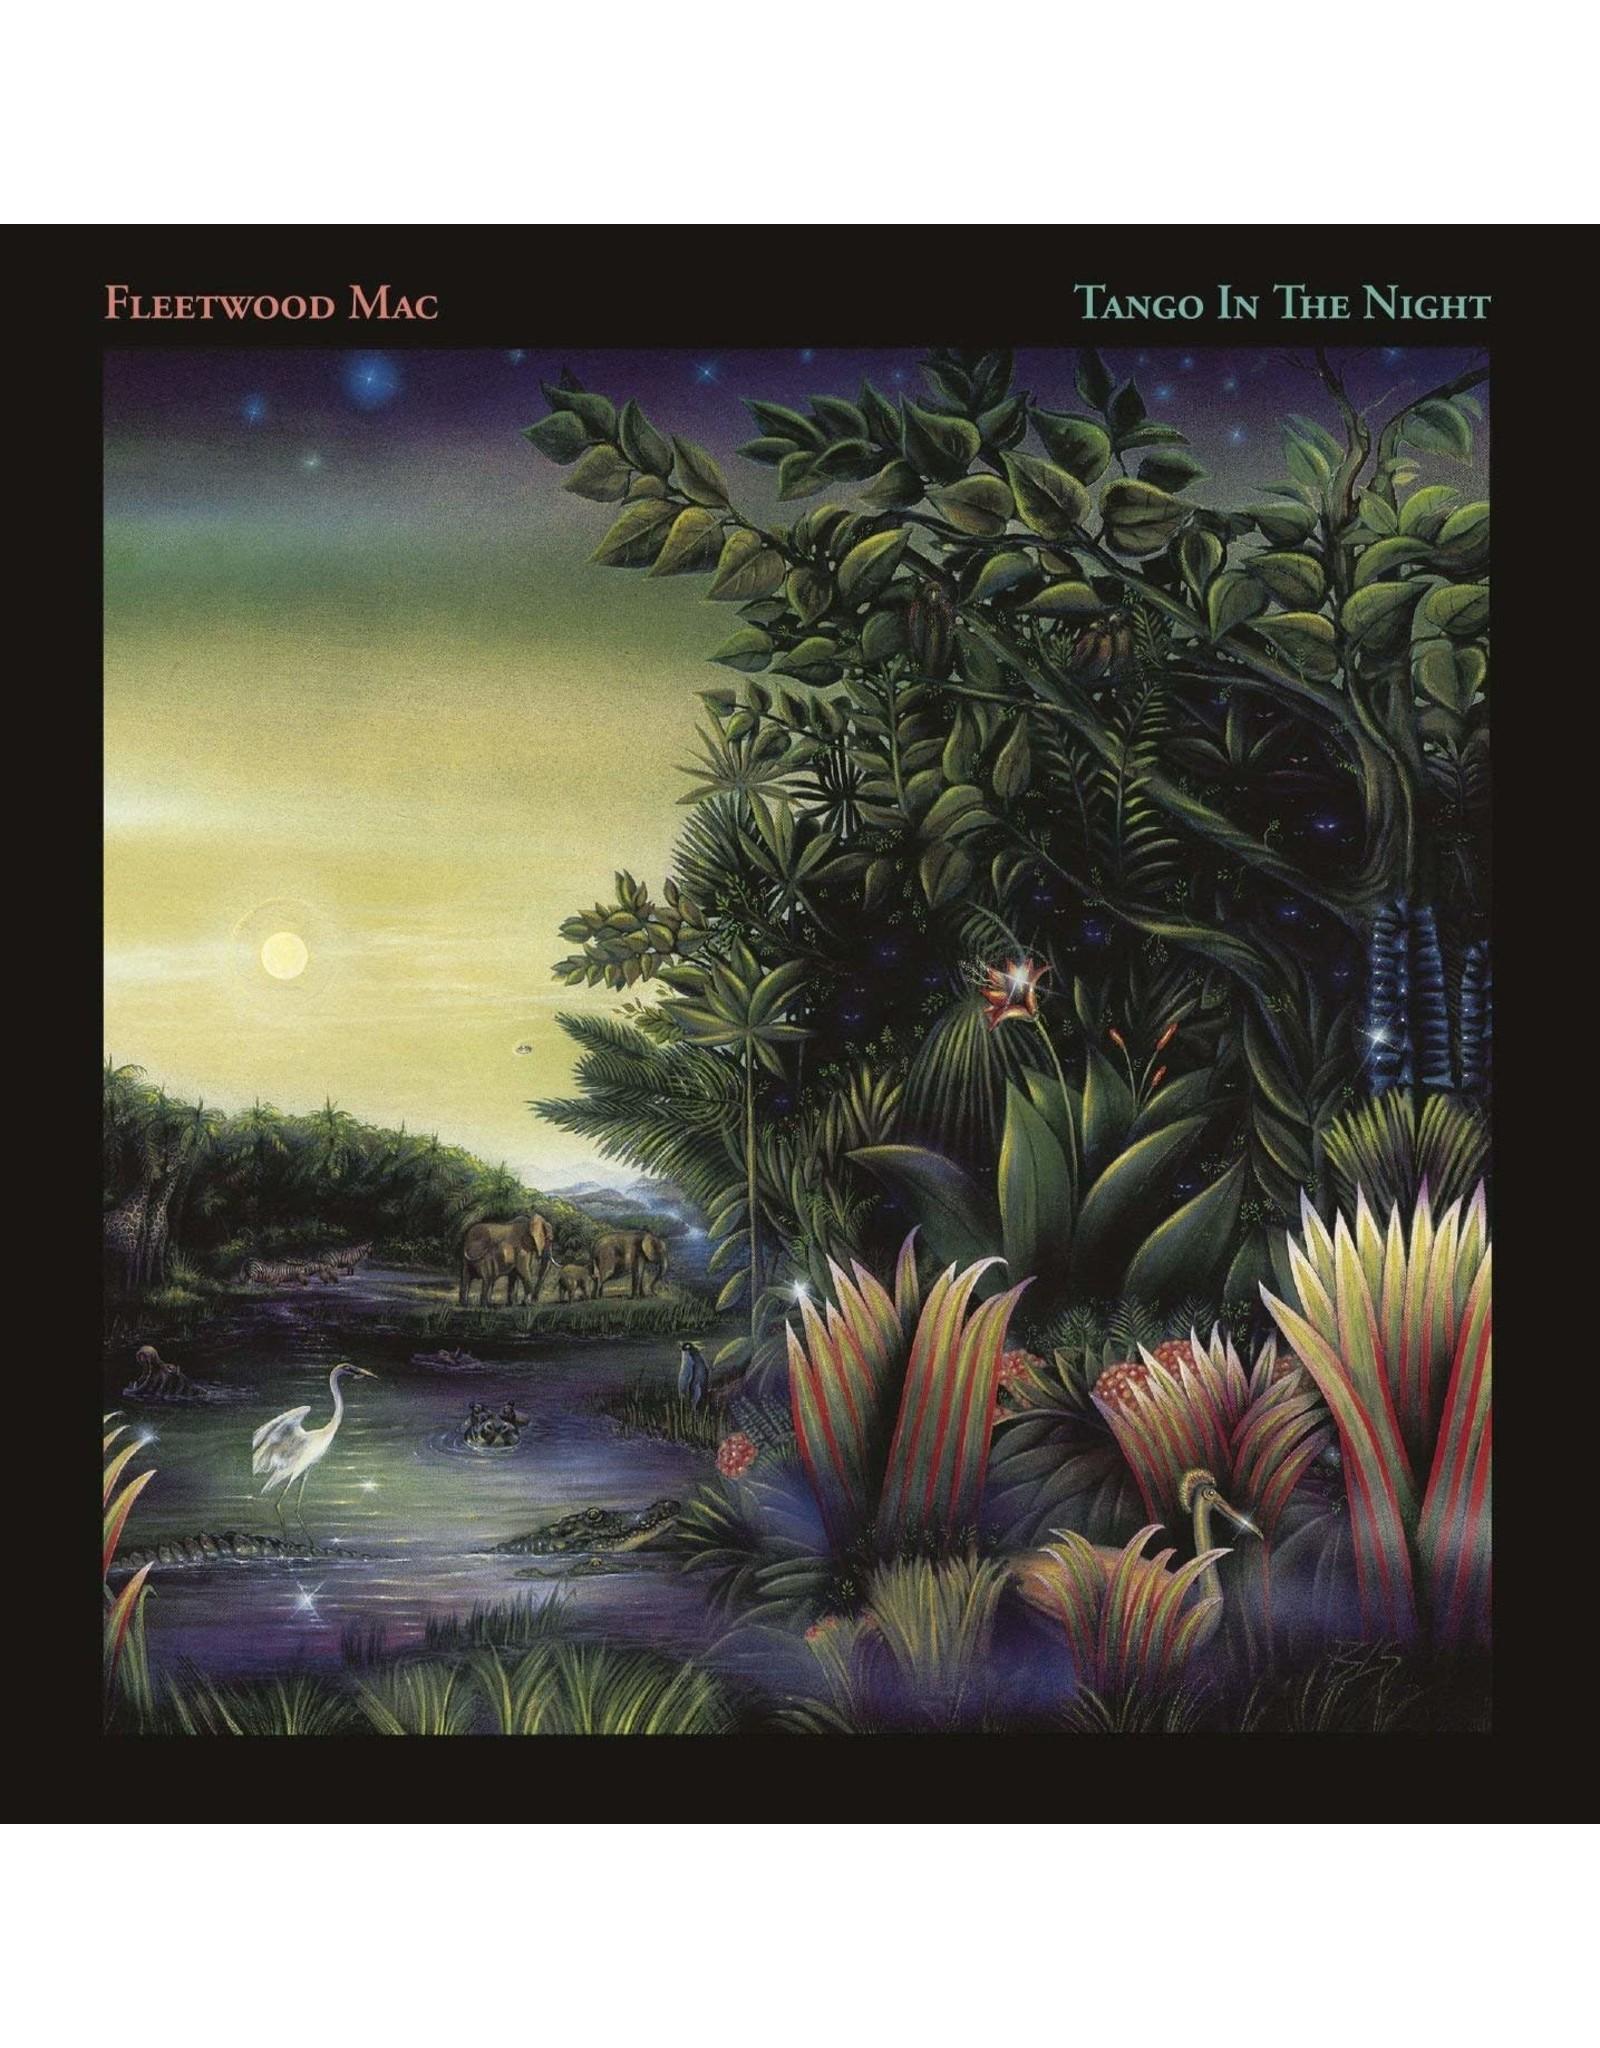 Fleetwood Mac - Tango In The Night (Green Vinyl)